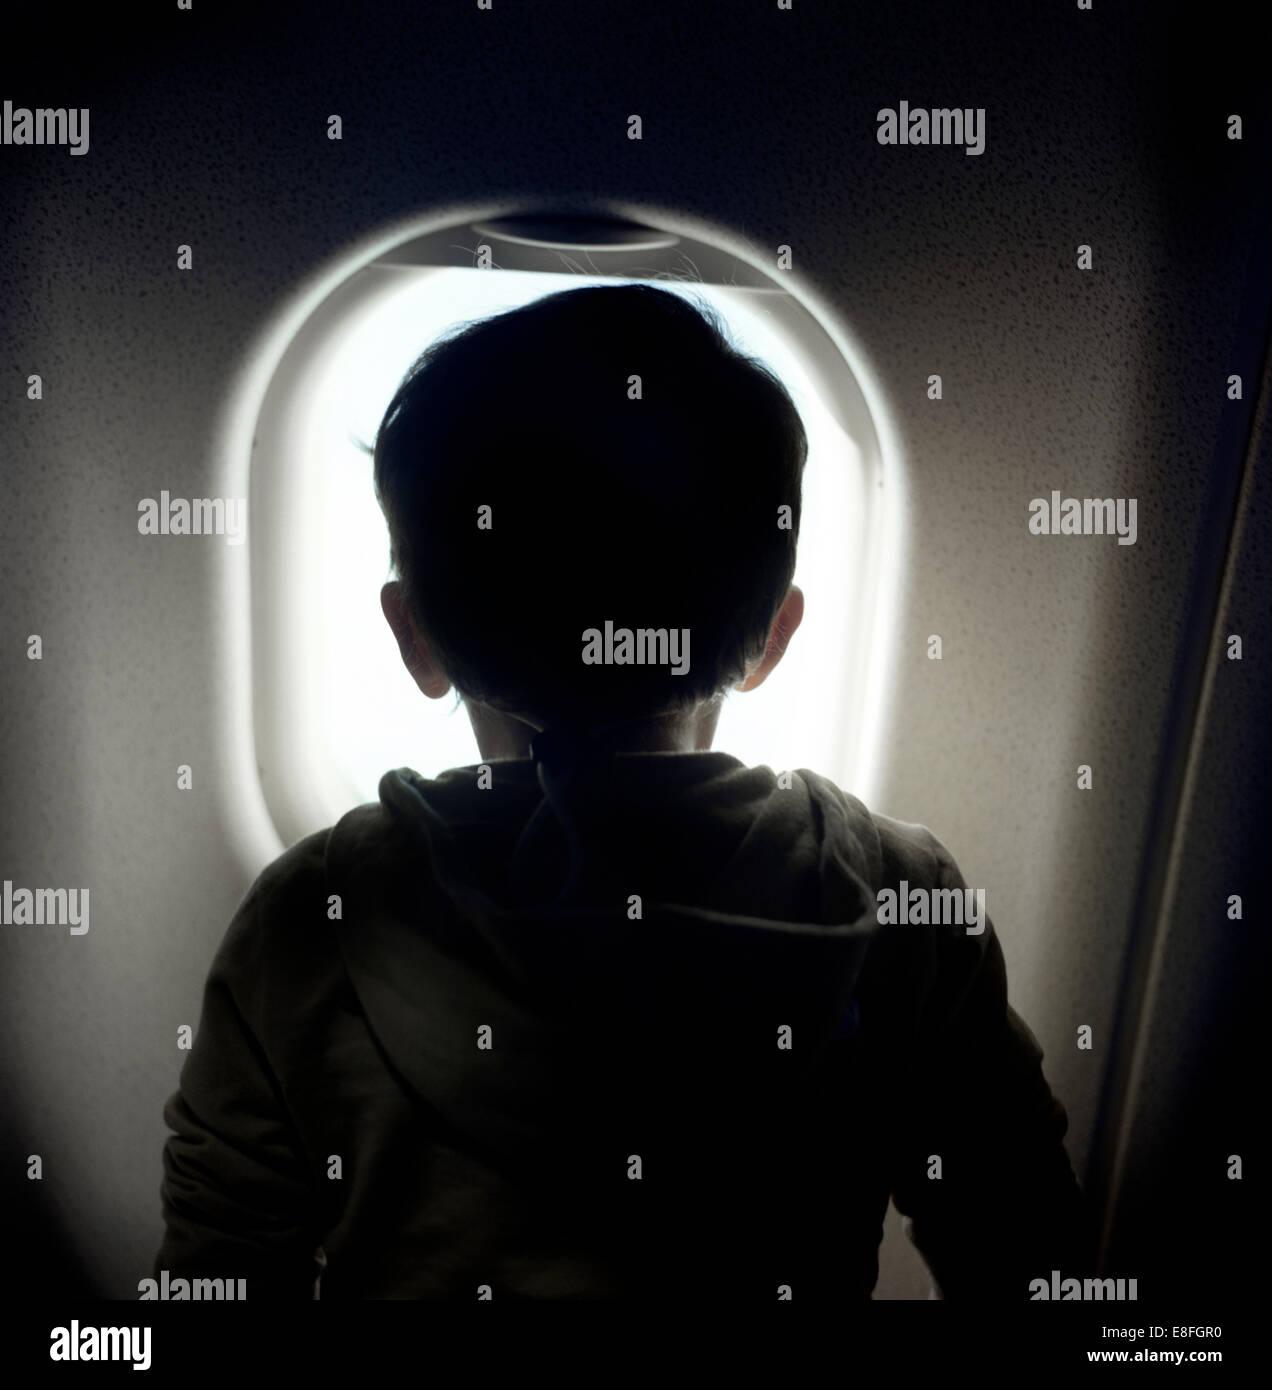 Boy looking through window on airplane - Stock Image